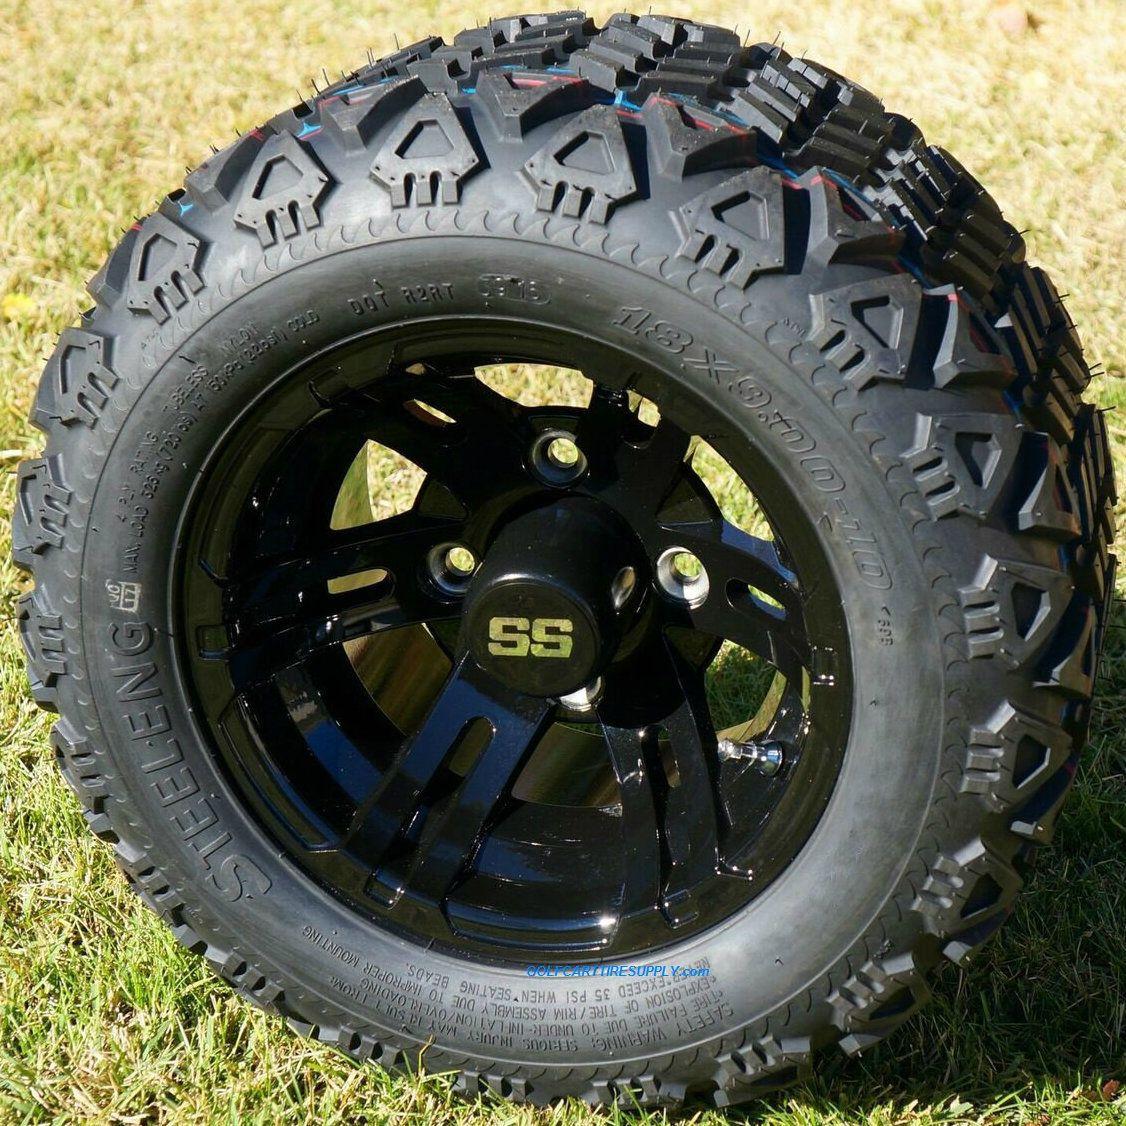 10 Bulldog Black Golf Cart Wheels And 18x9 10 Dot All Terrain Golf Cart Tires Combo Golf Cart Tire Supply Golf Cart Tires Golf Cart Wheels Golf Carts